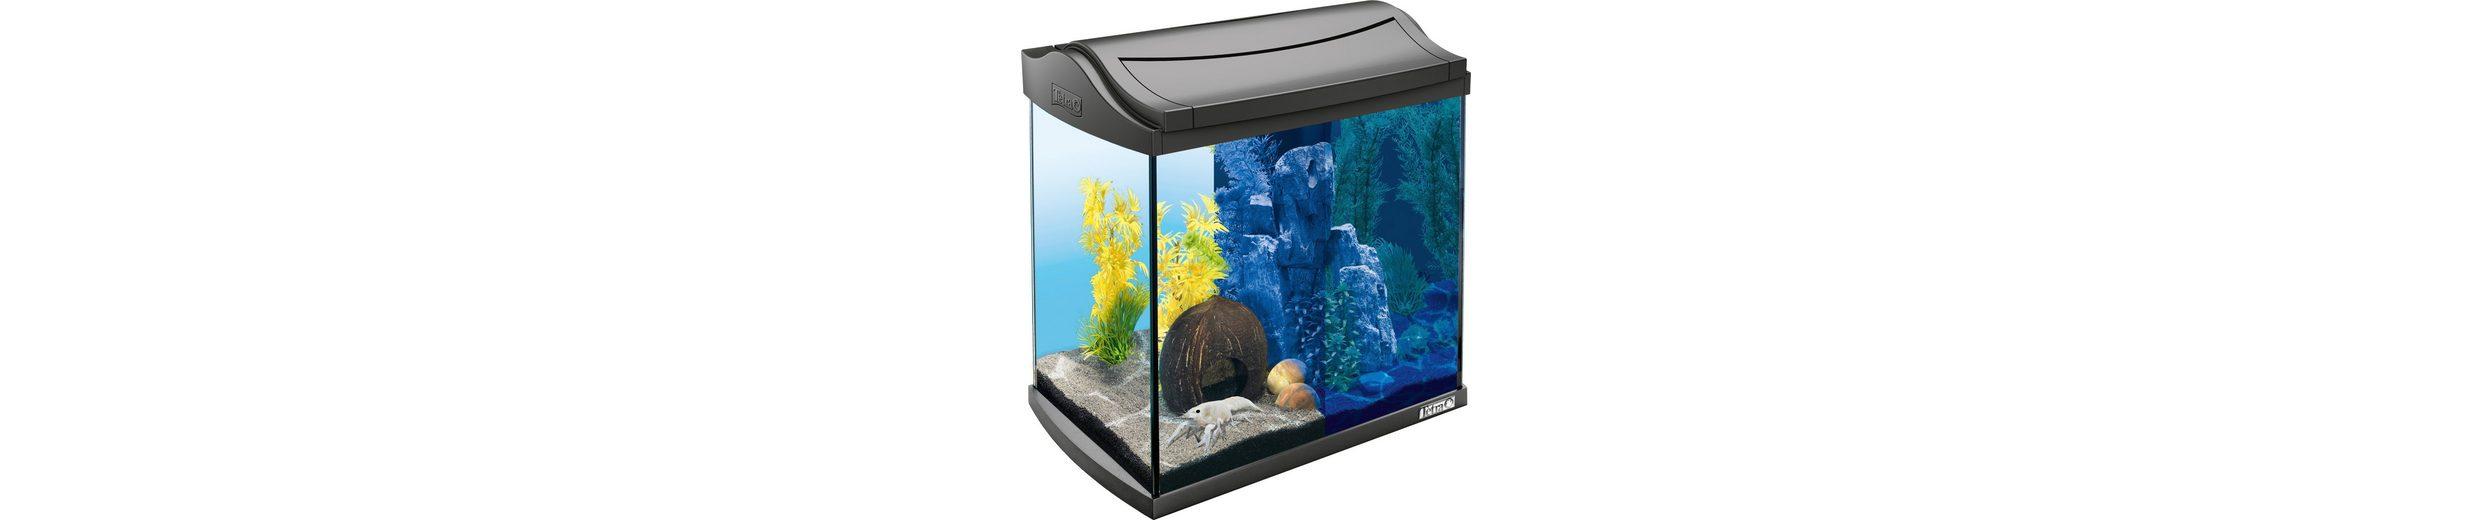 Aquarium »AquaArt LED Discovery Line« 30 l, anthrazit